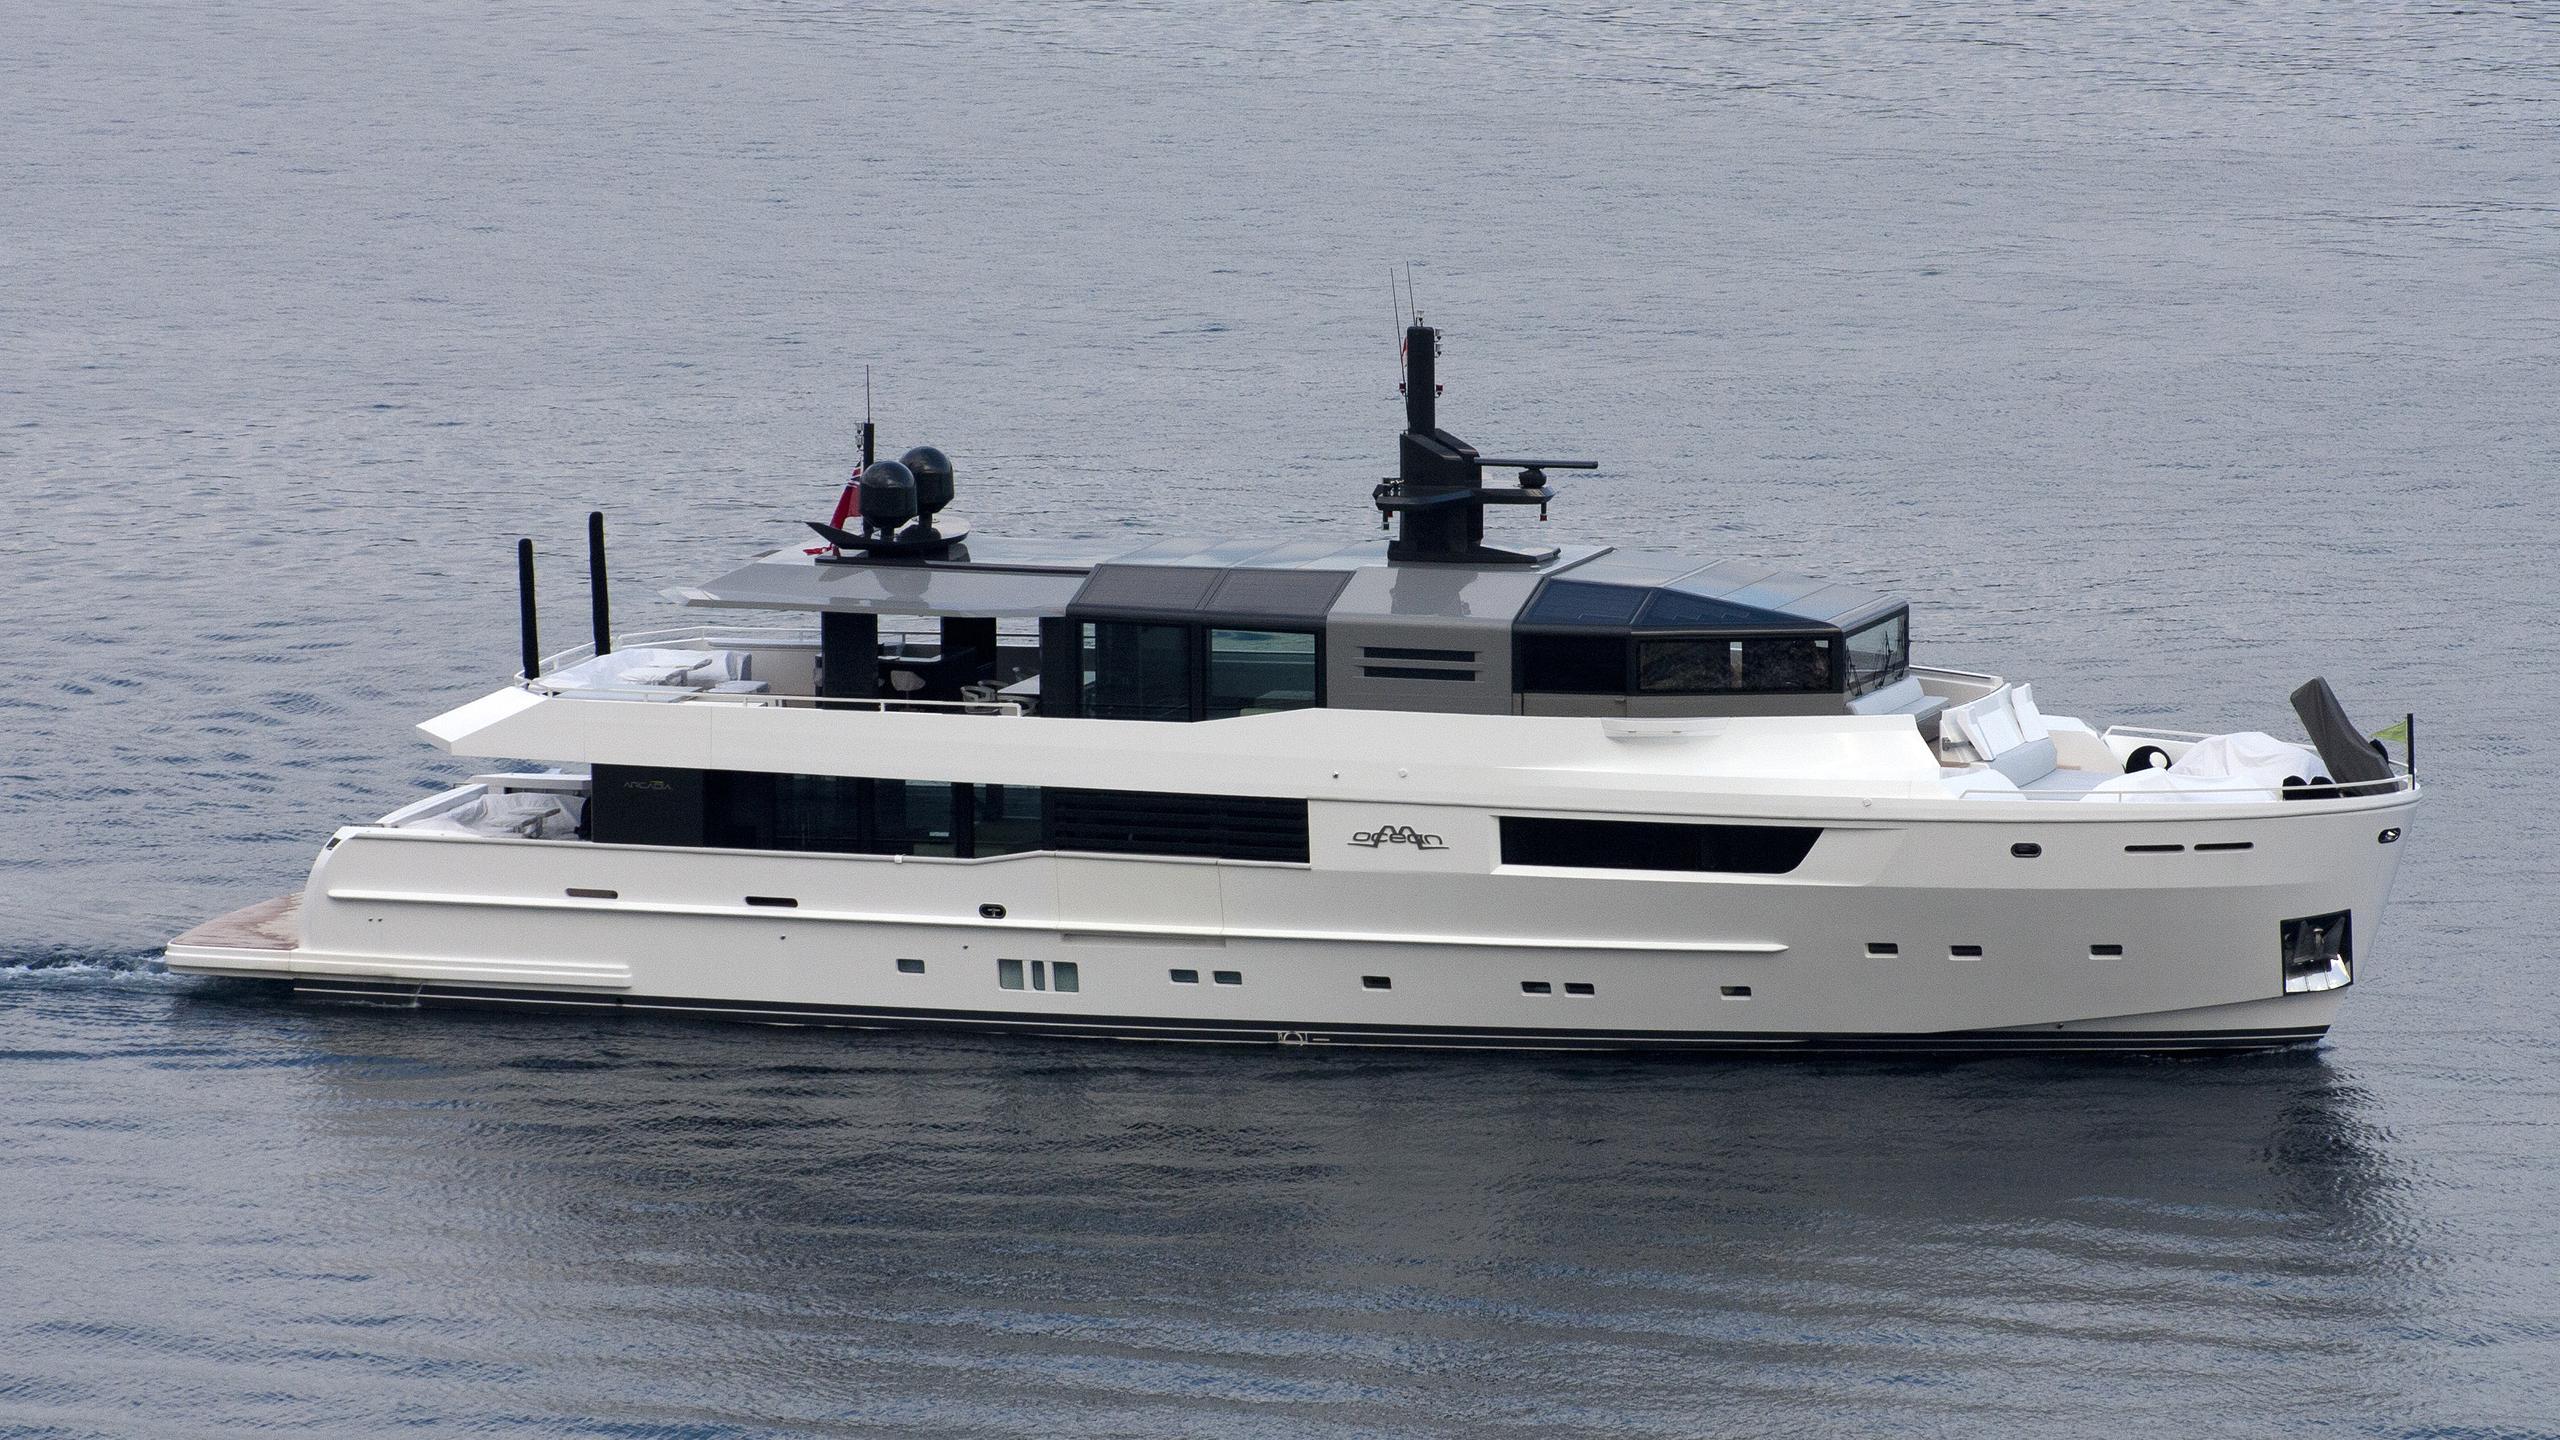 m ocean motoryacht arcadia yachts 2012 35m profile